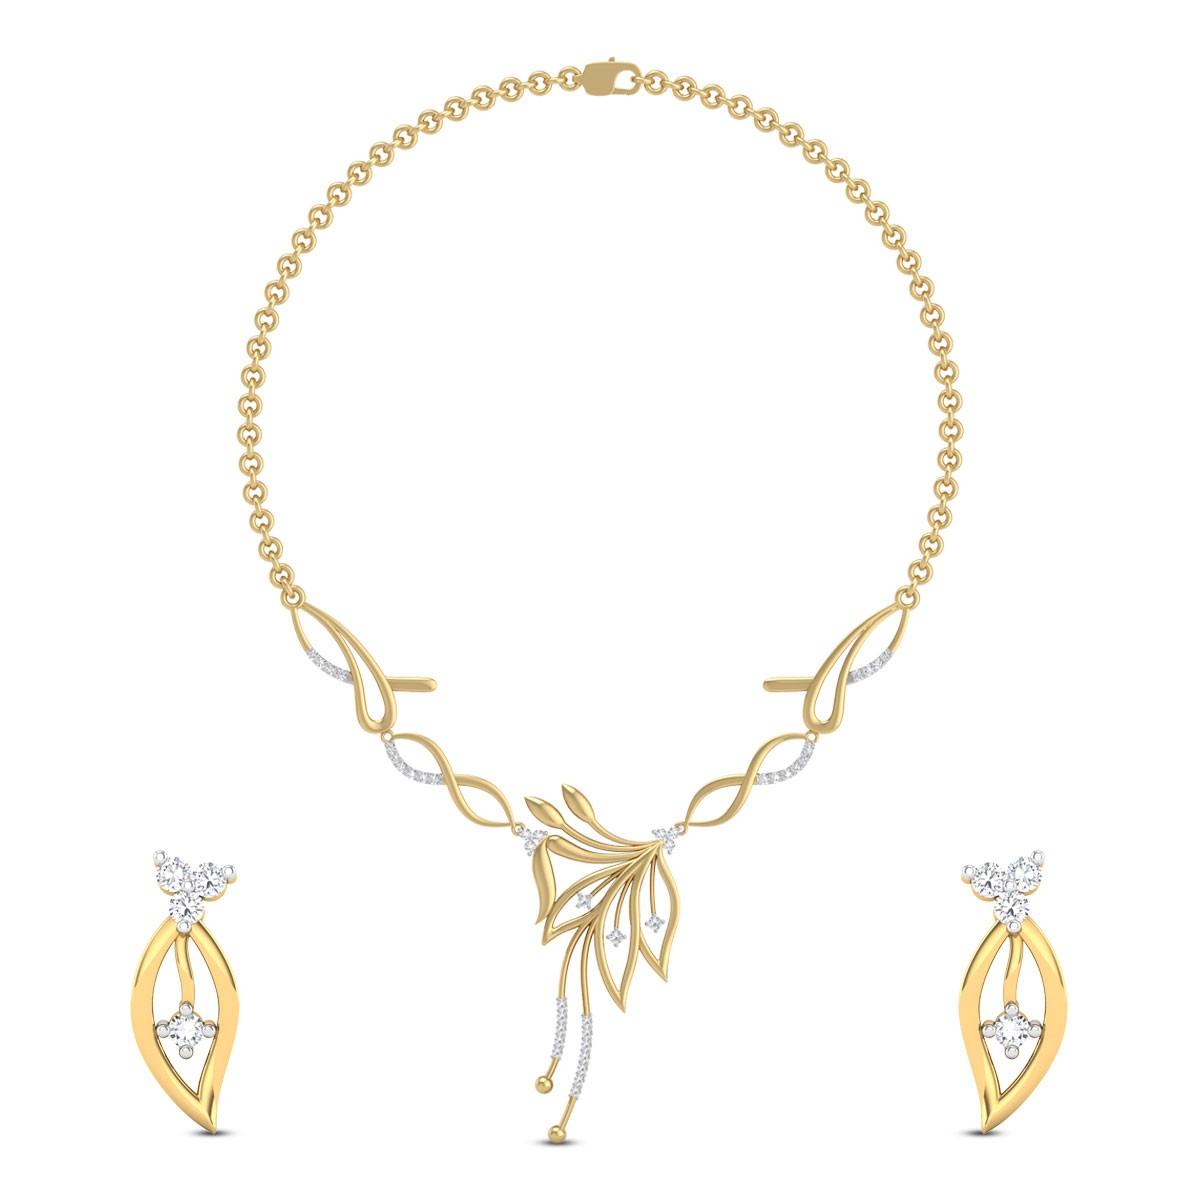 Ulani Floral Diamond Necklace Set